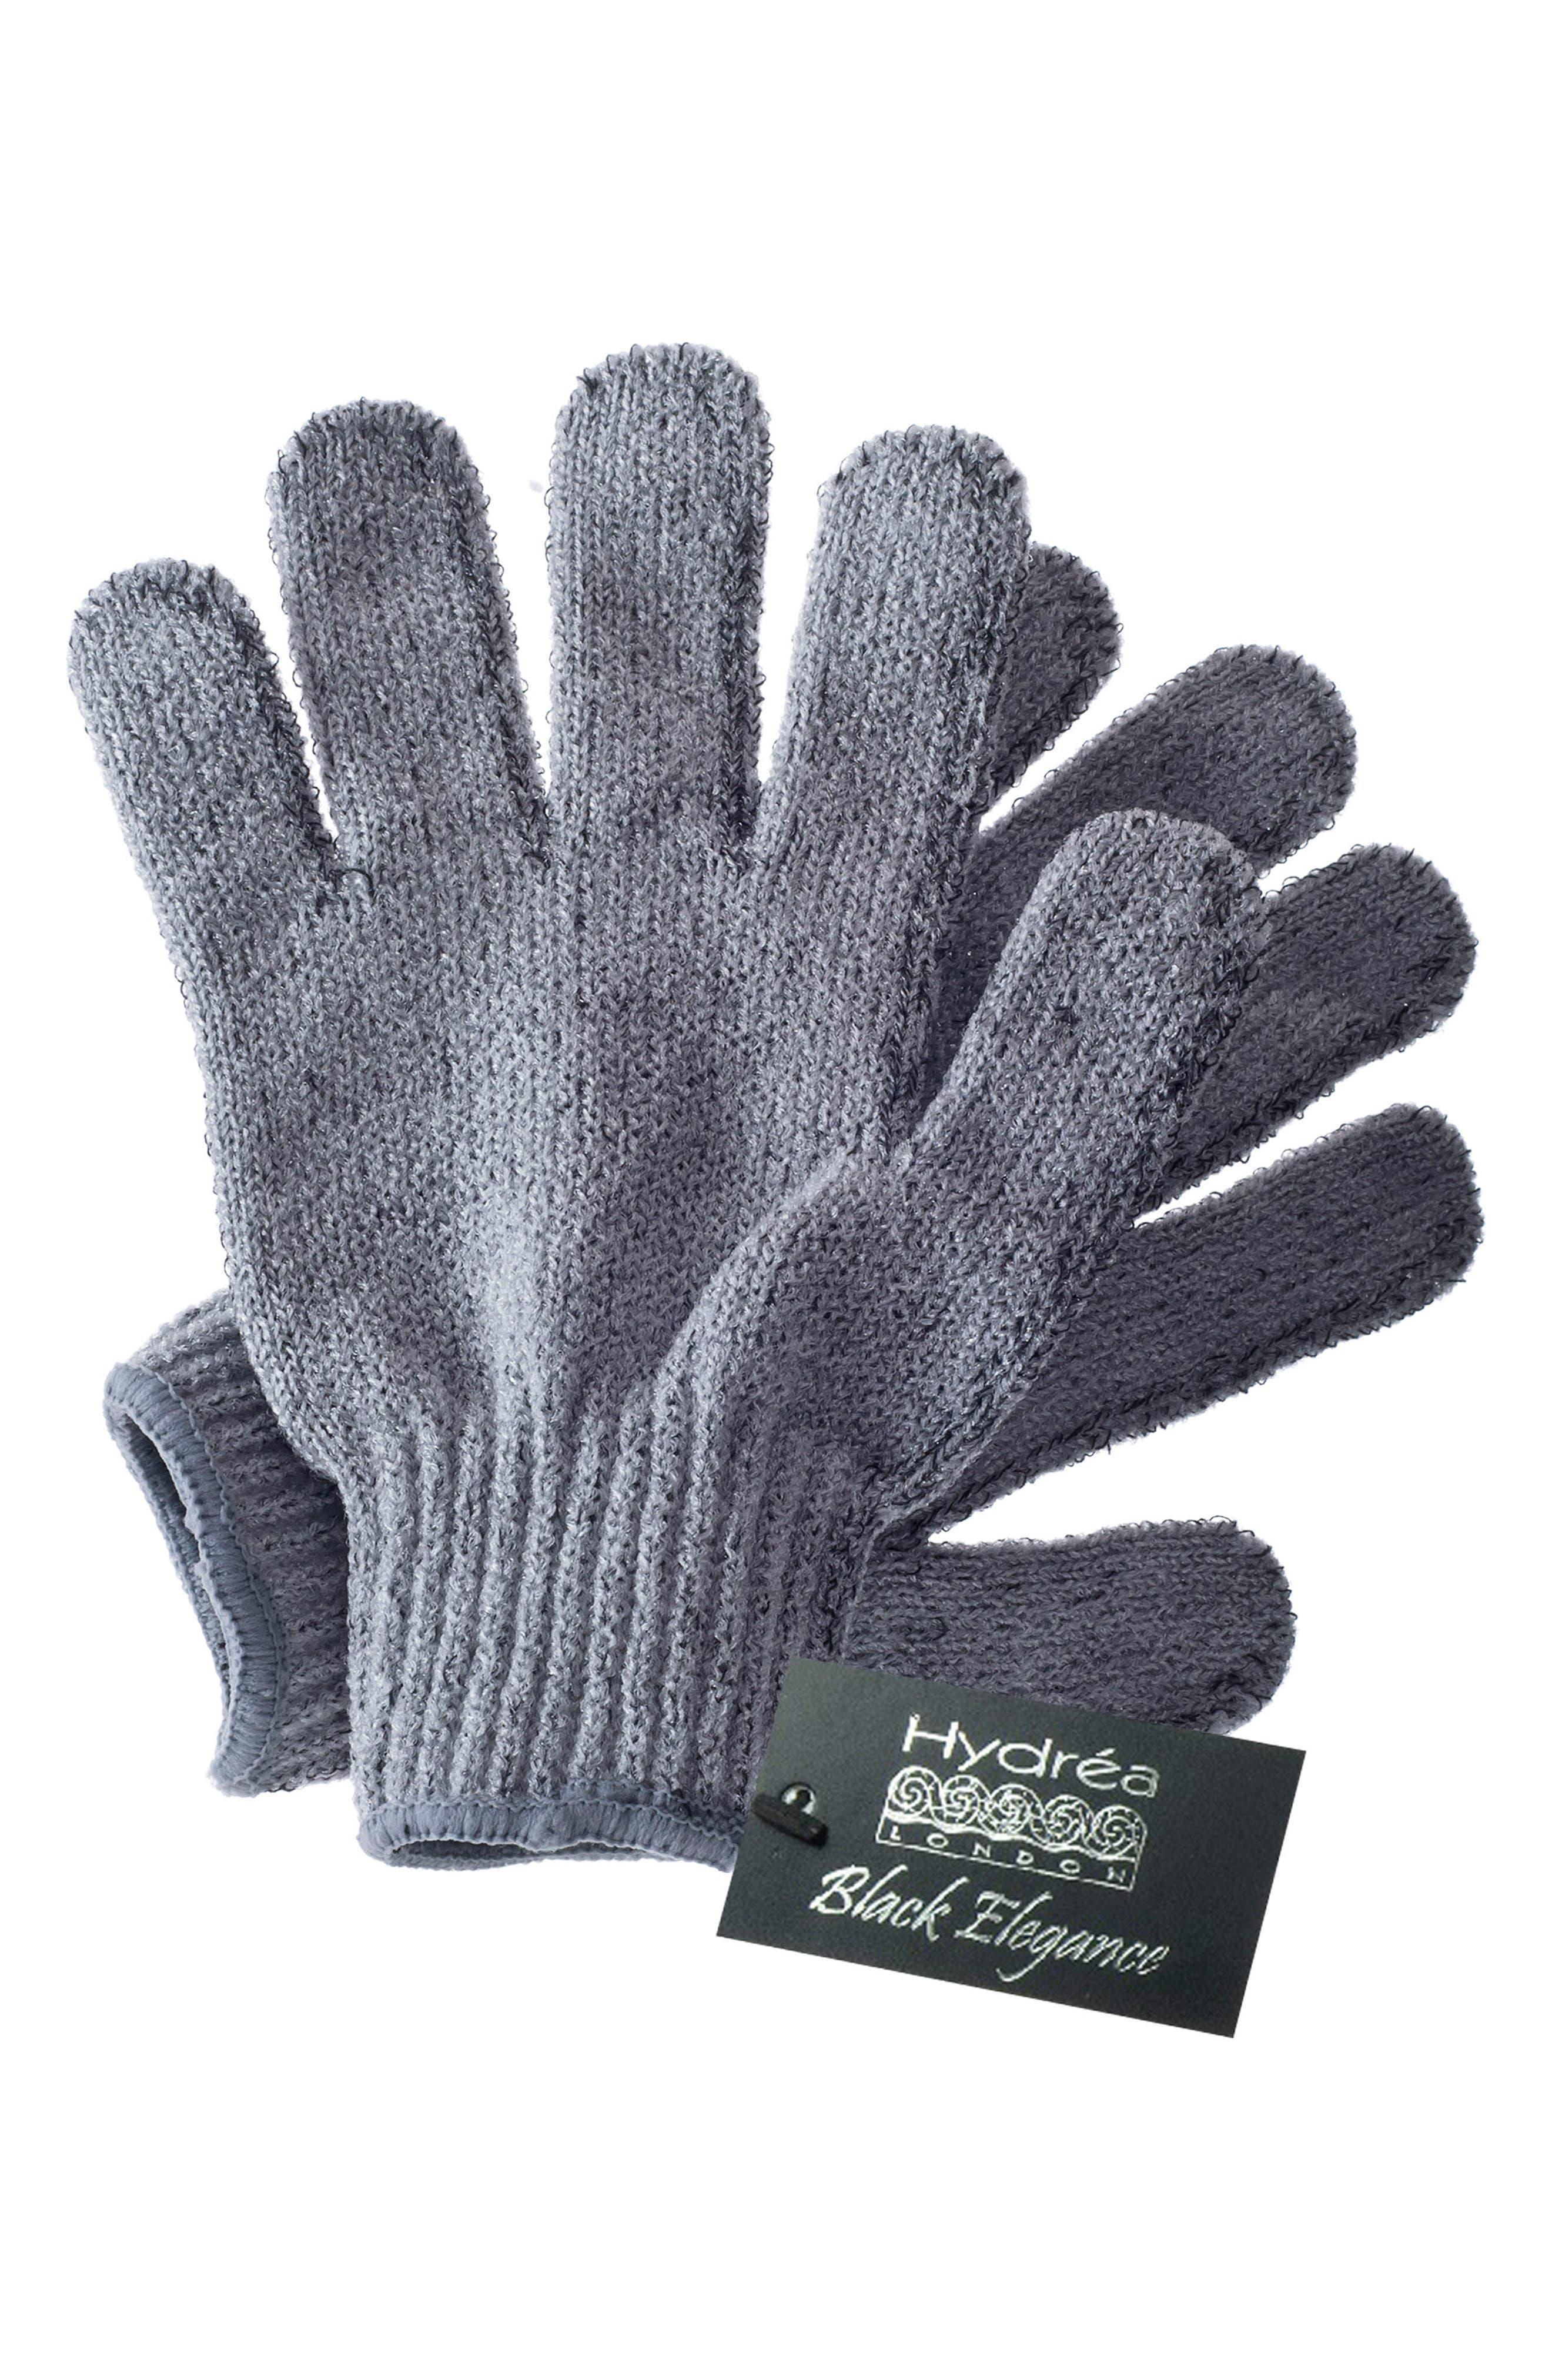 Carbonized Exfoliating Gloves,                             Alternate thumbnail 2, color,                             000